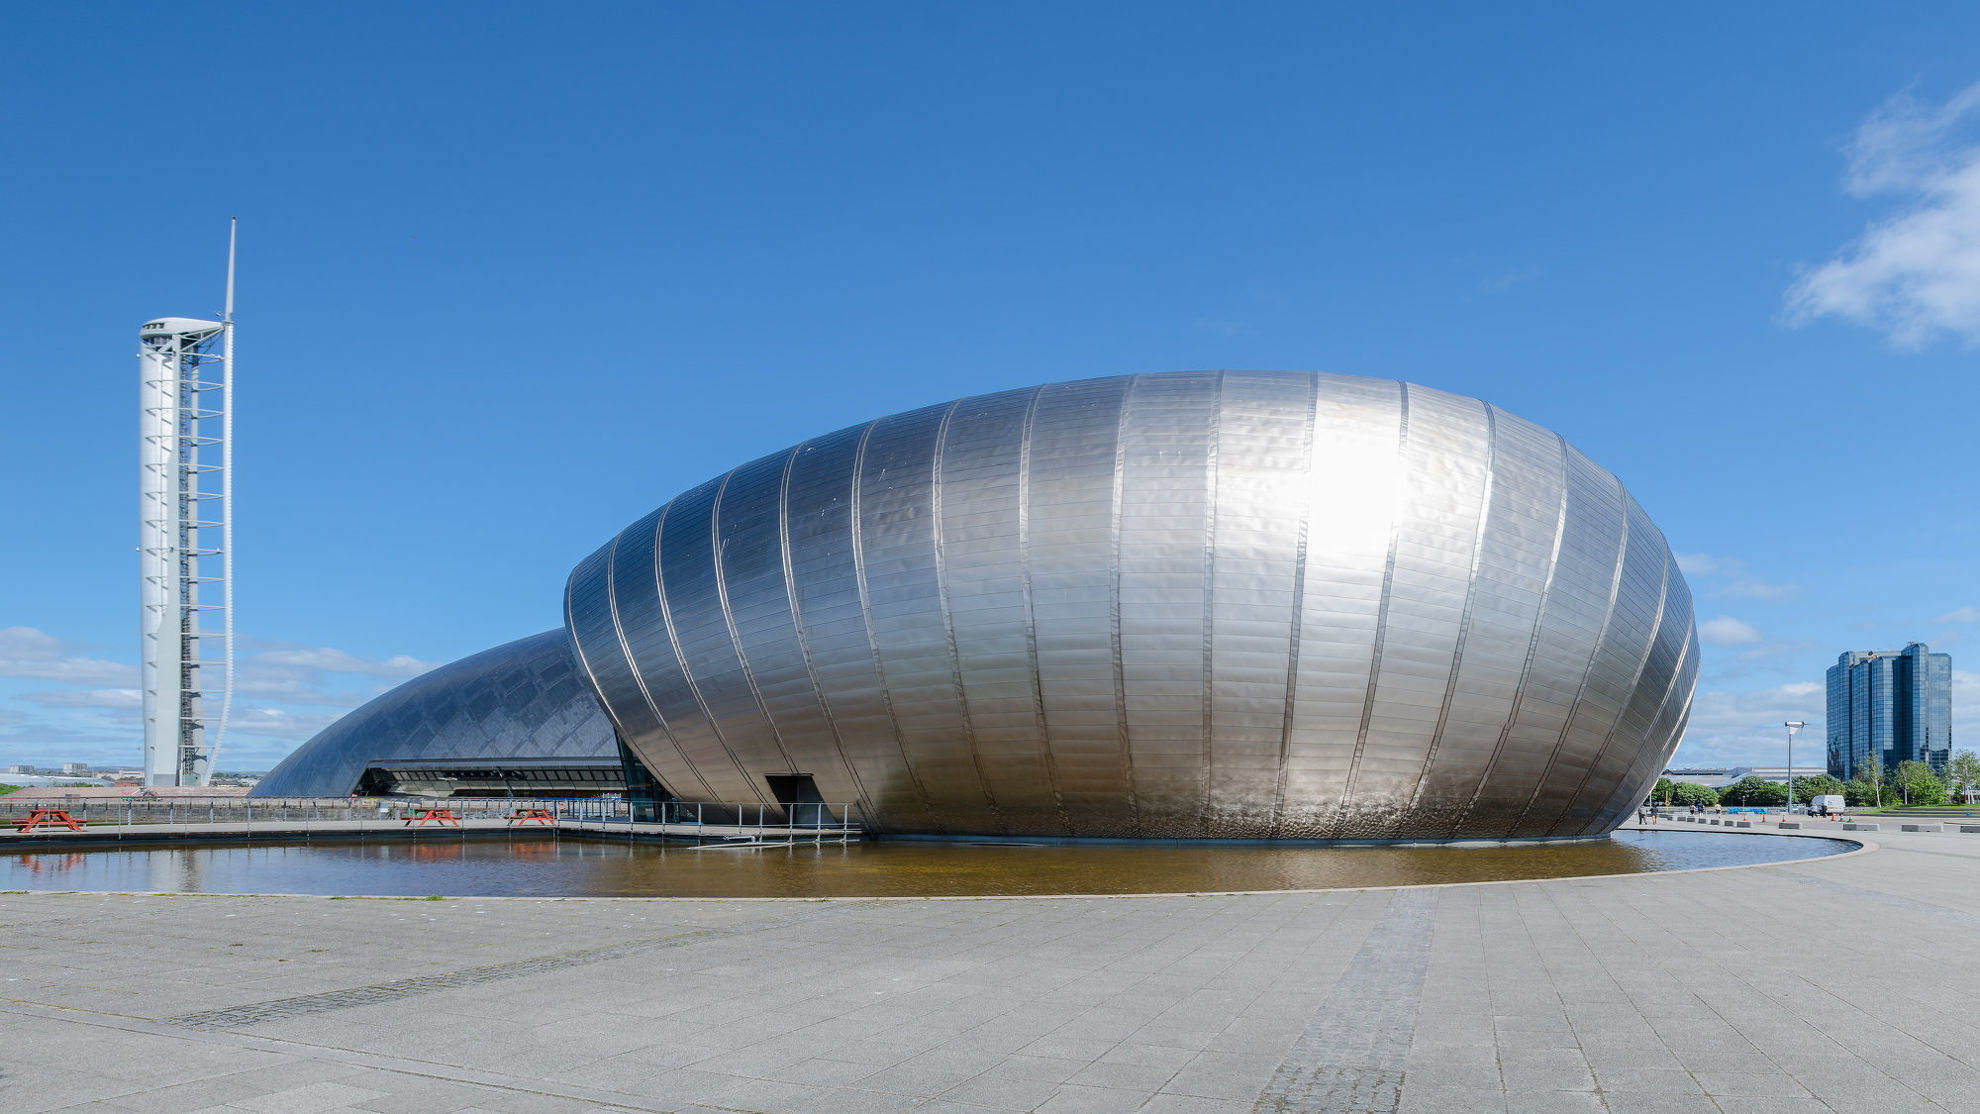 Explore Glasgow Science Centre